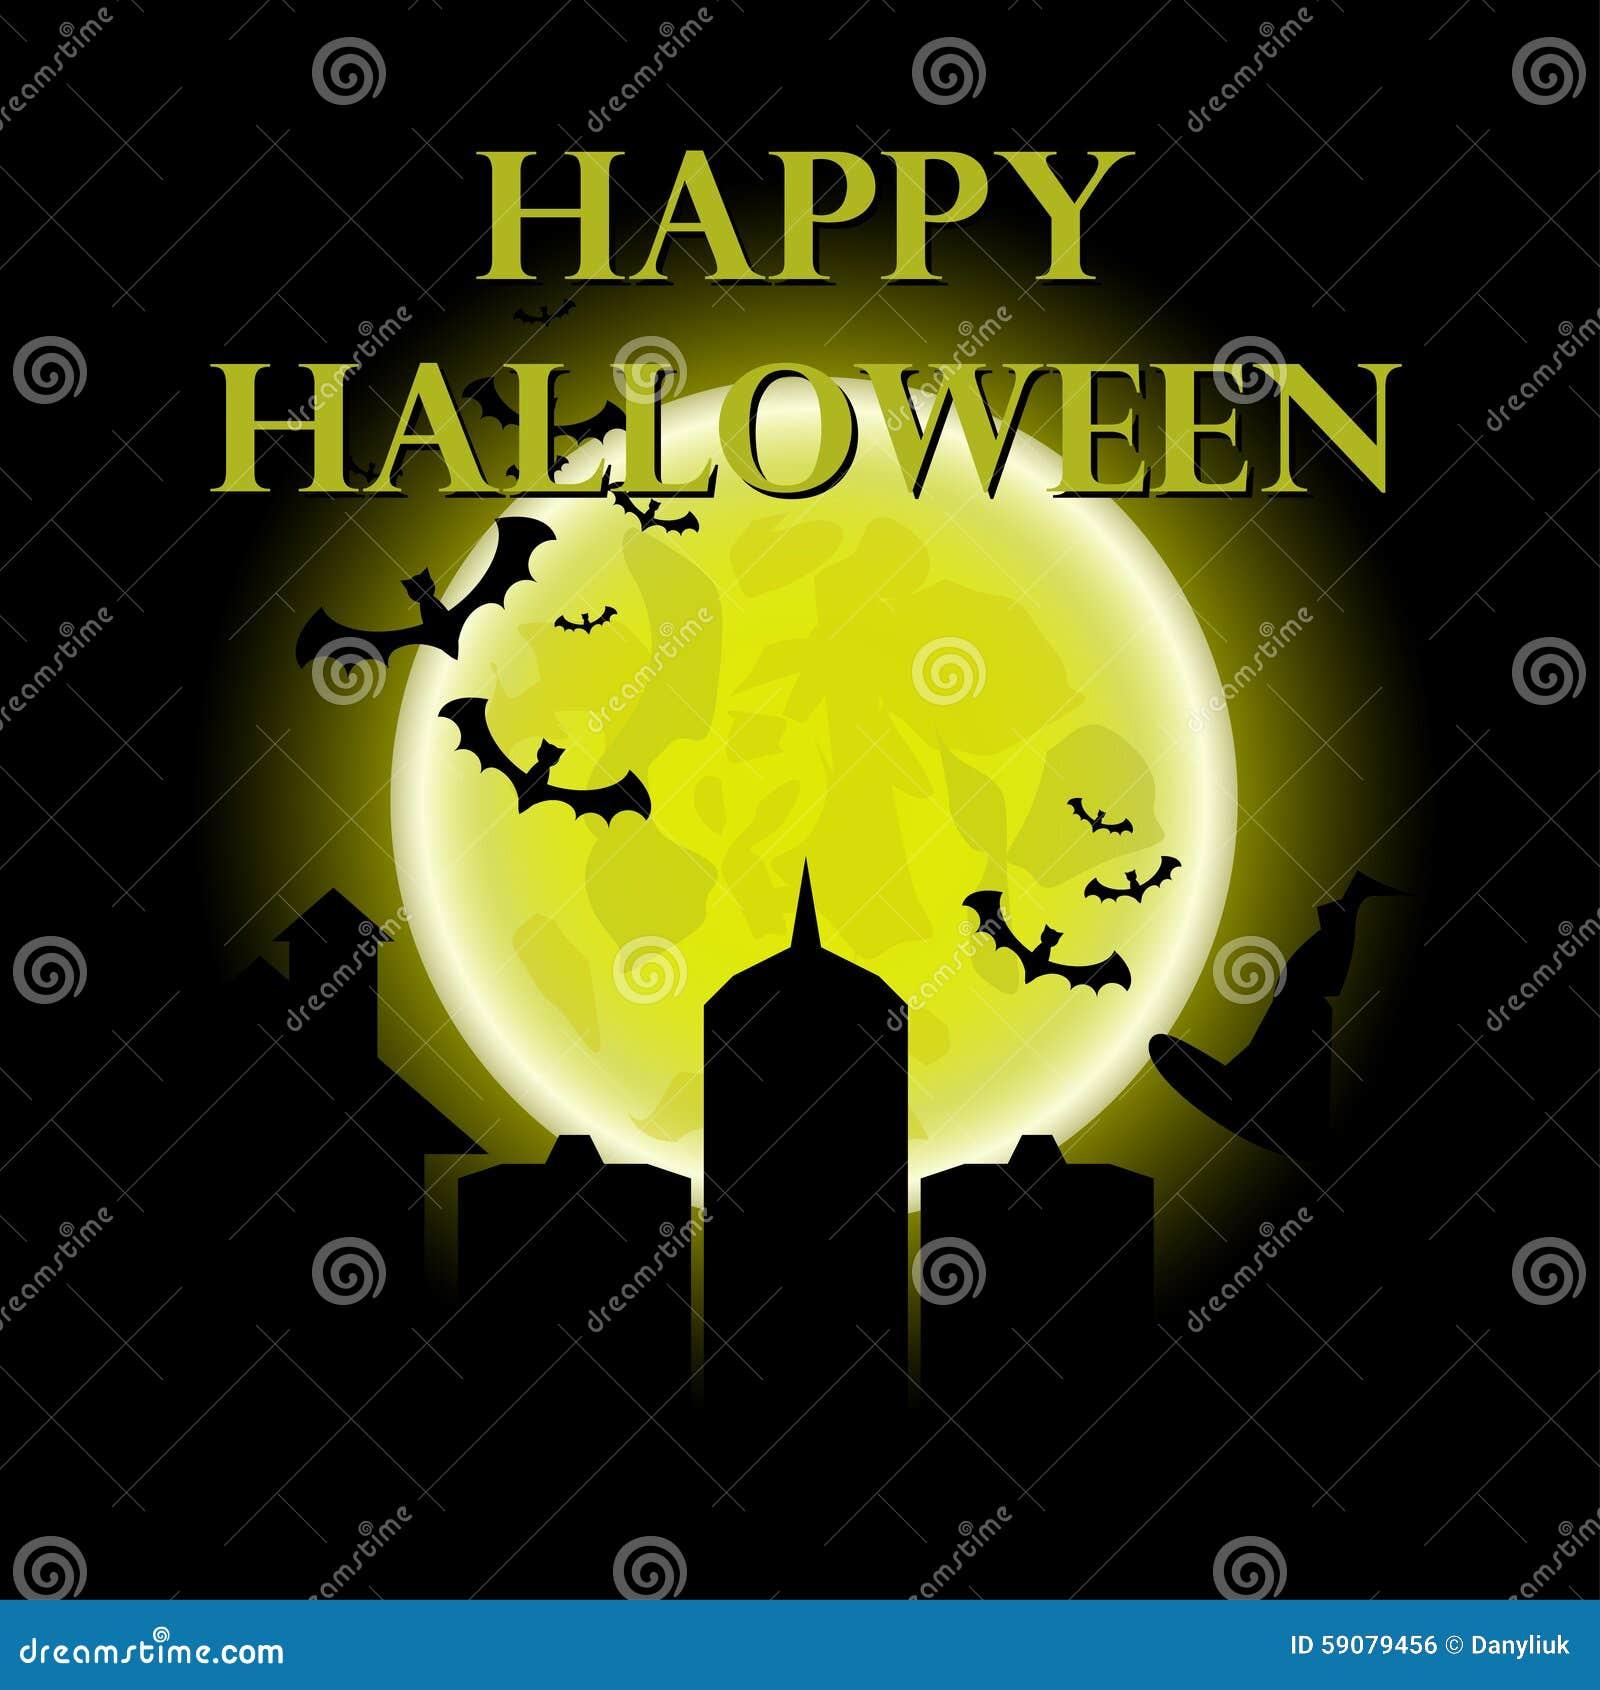 happy halloween message design background, illustration.halloween